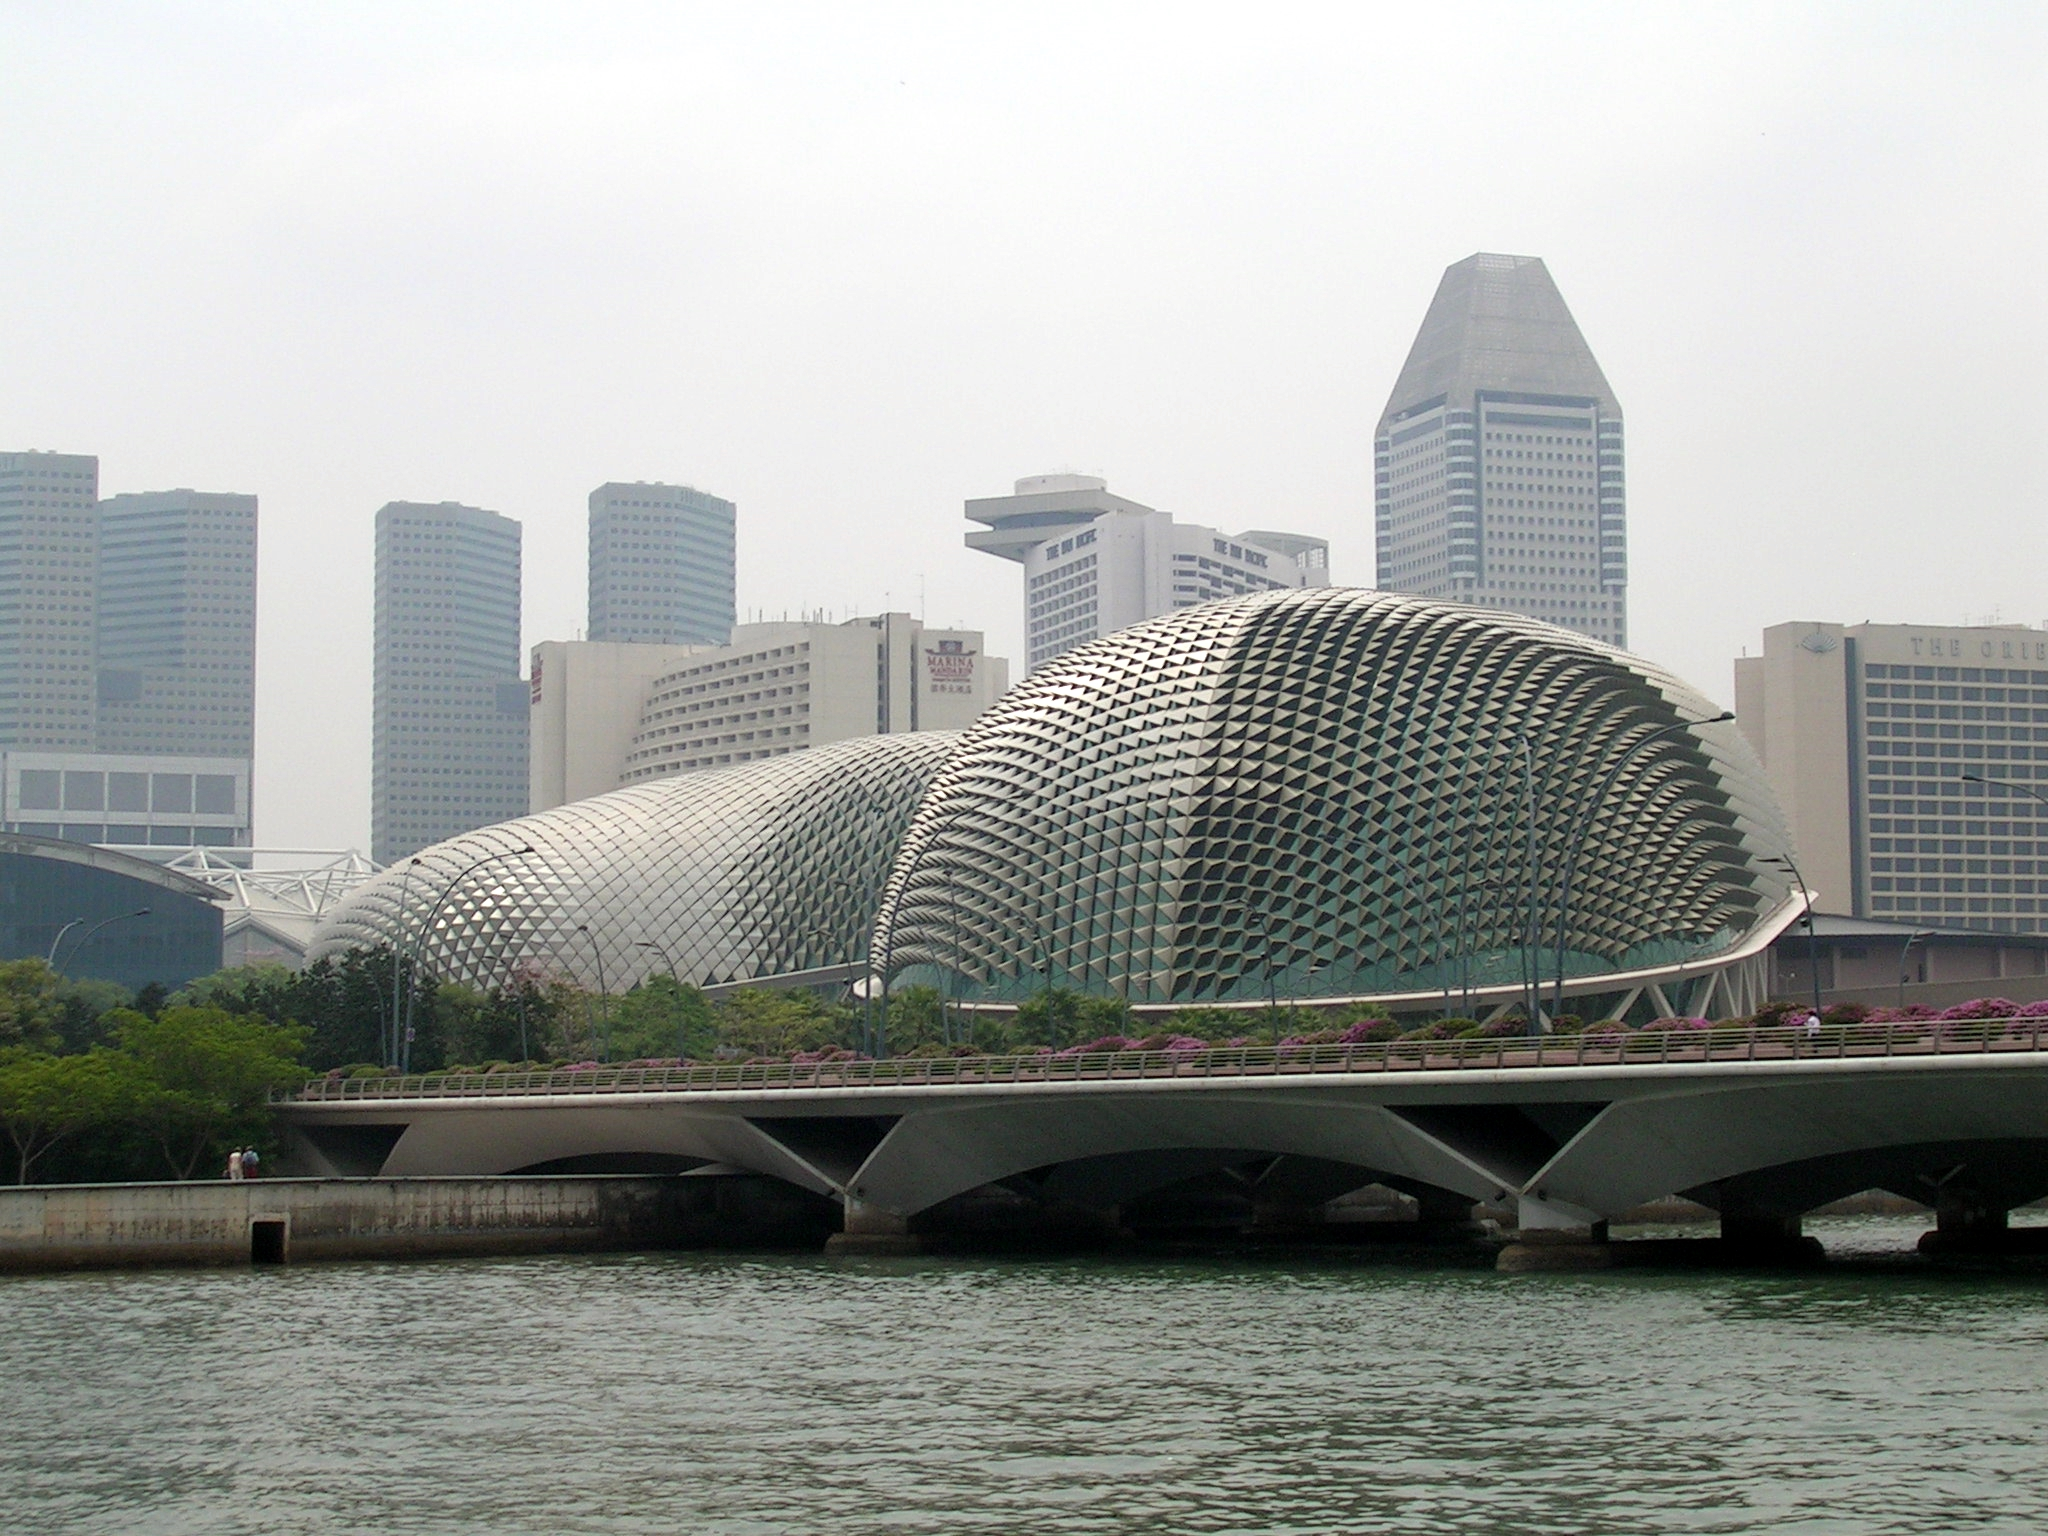 http://commons.wikimedia.org/wiki/Image:Esplanade_Singapore_01.jpg